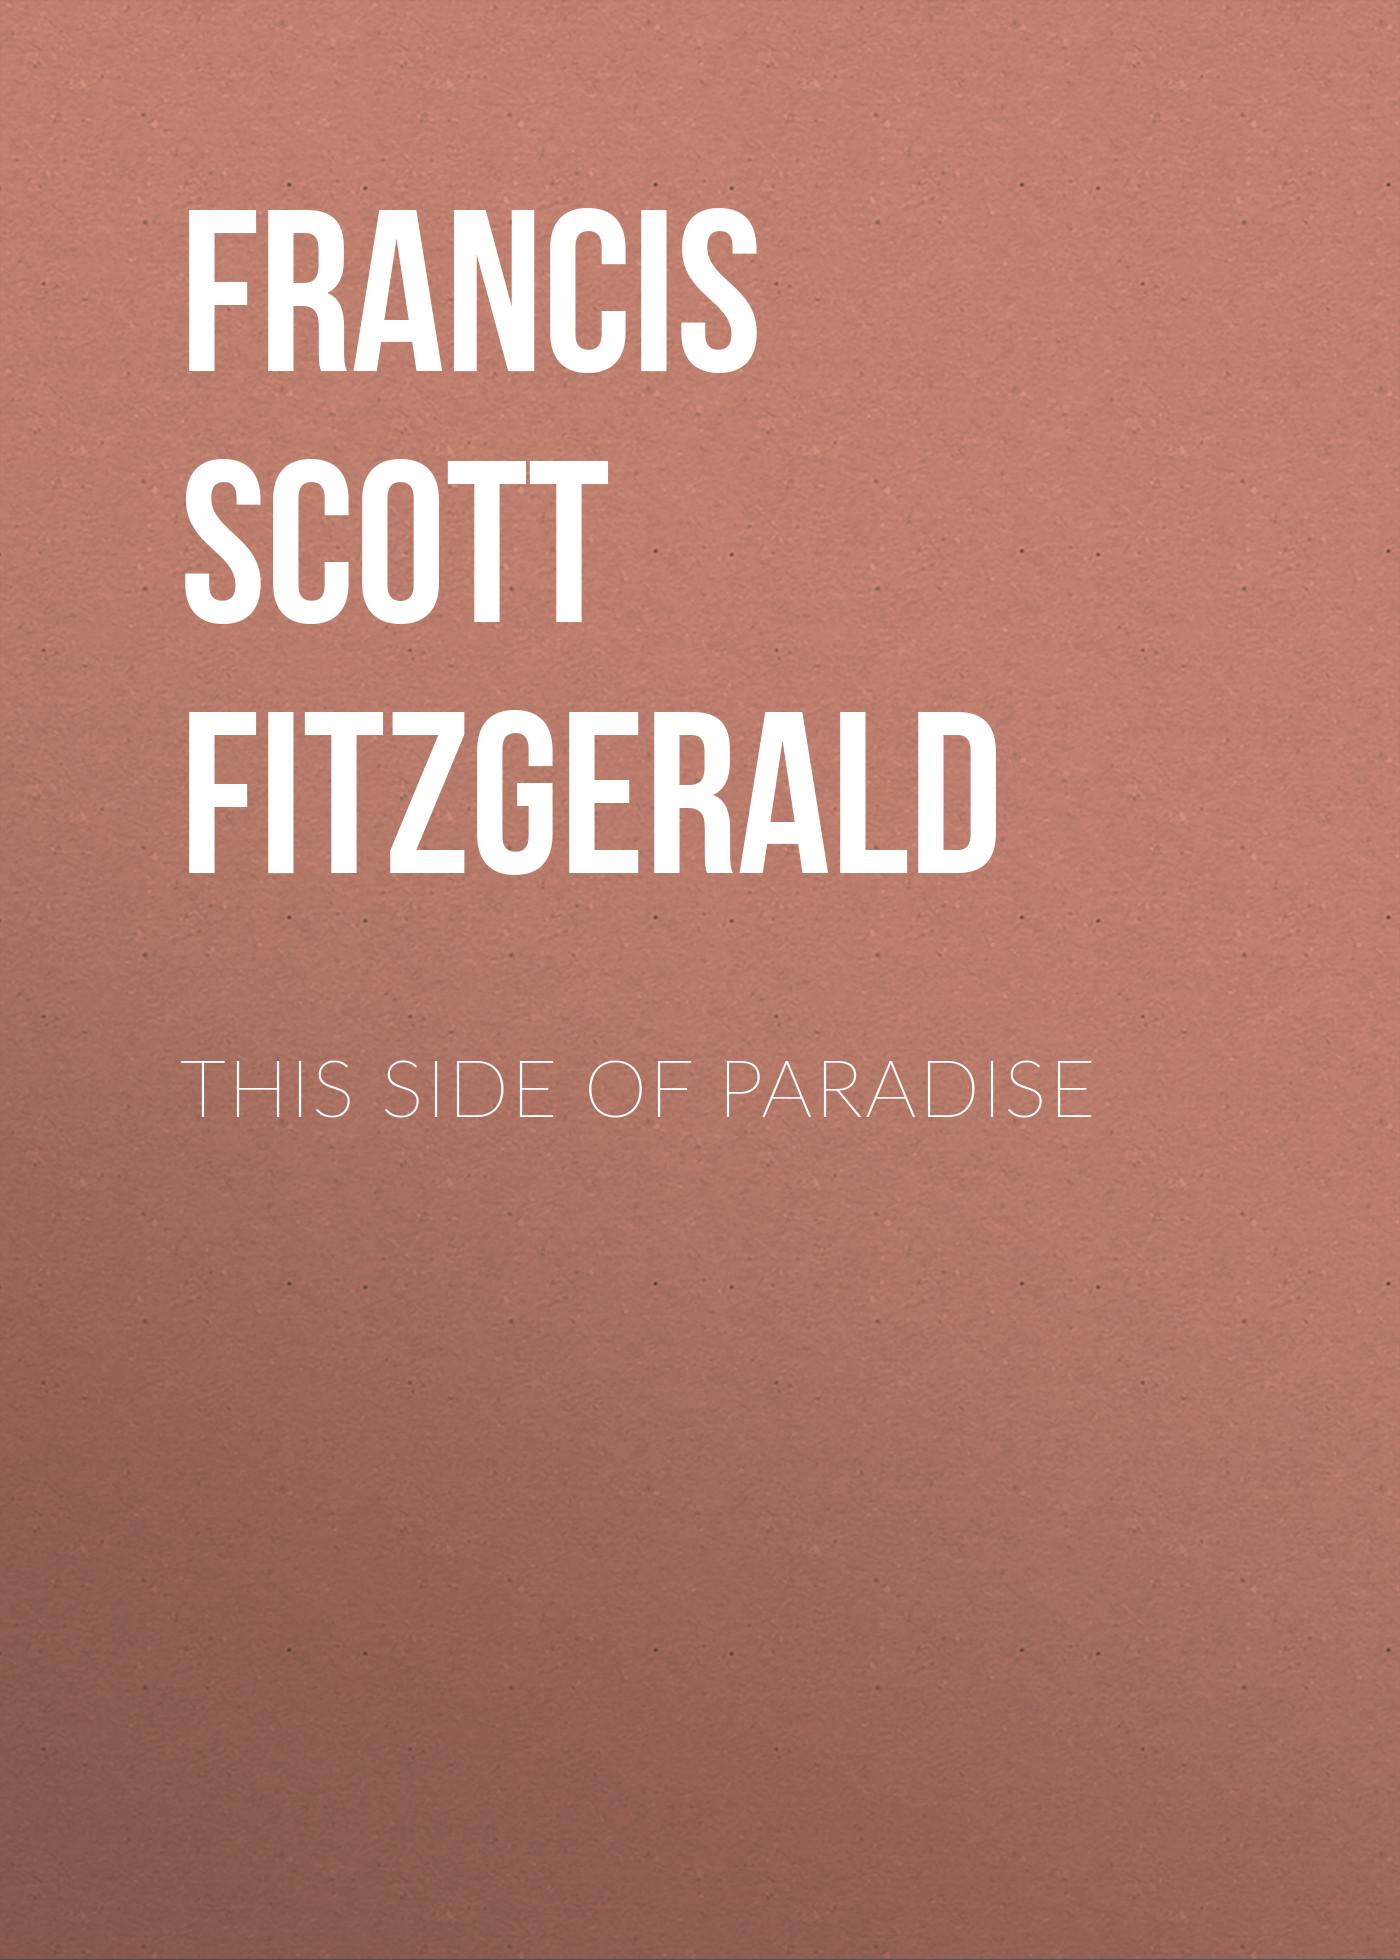 цена на Фрэнсис Скотт Фицджеральд This Side of Paradise